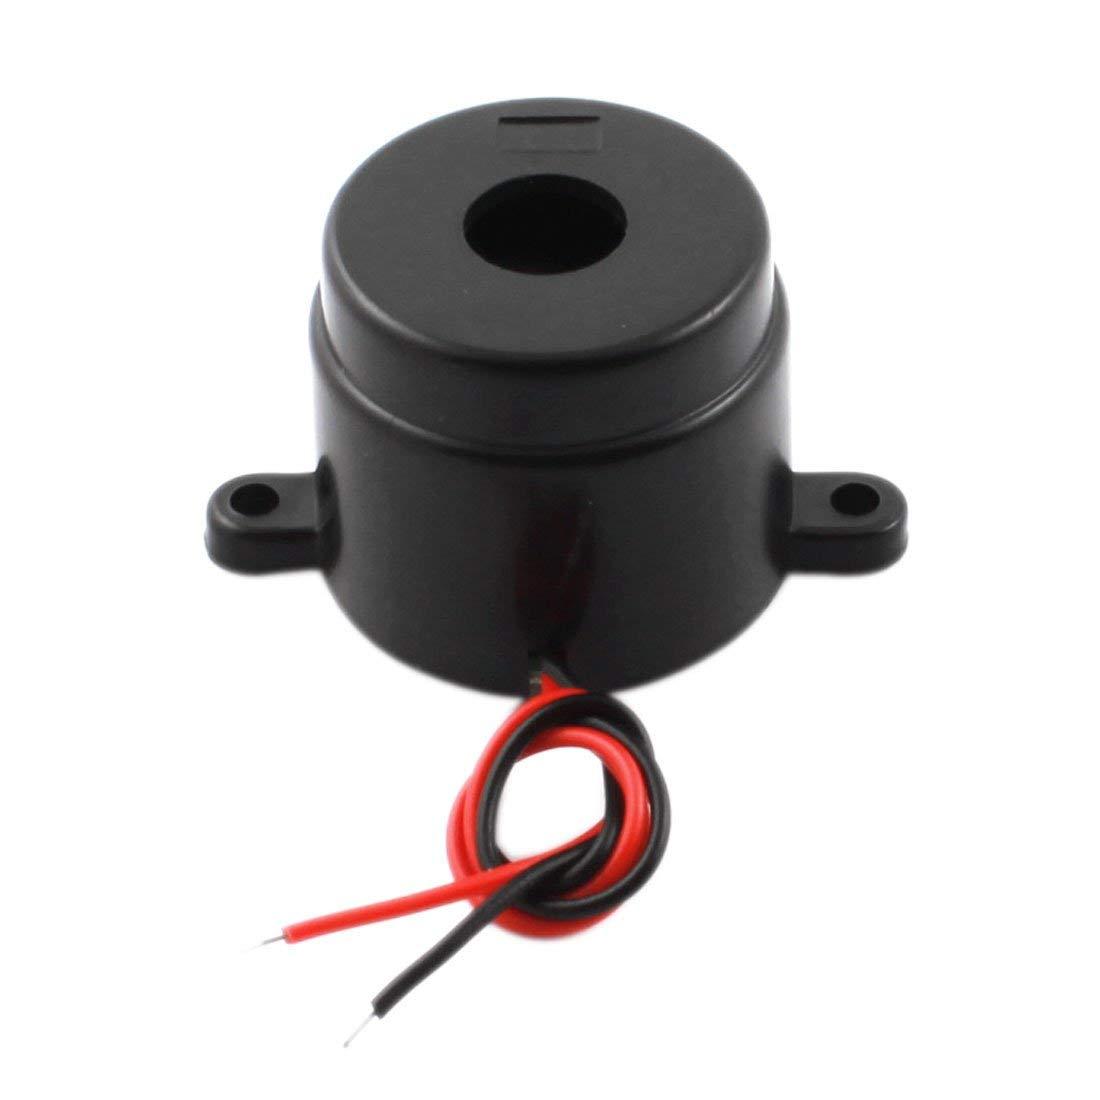 Cheap Buzzer Component, find Buzzer Component deals on line at